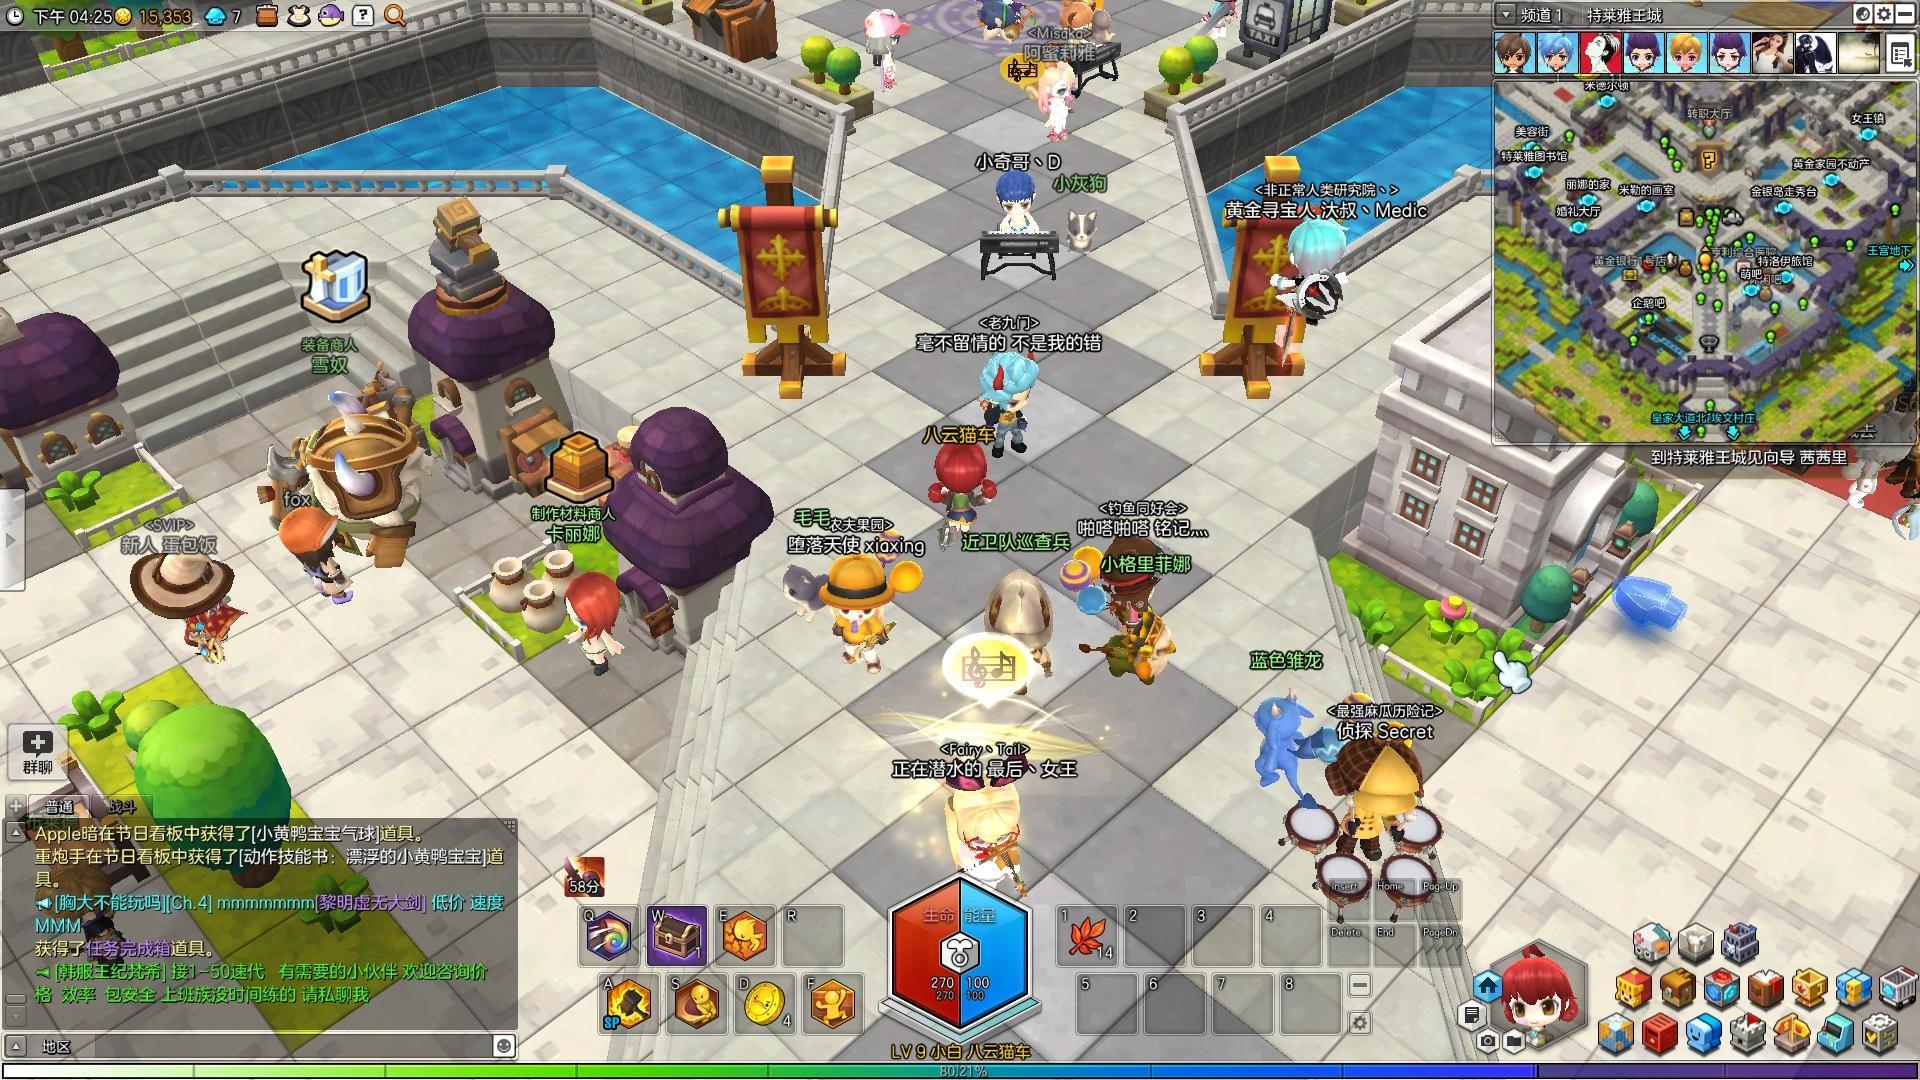 49you游戏评测 - 《冒险岛2》点评:mmorpg与休闲游戏的完美结合